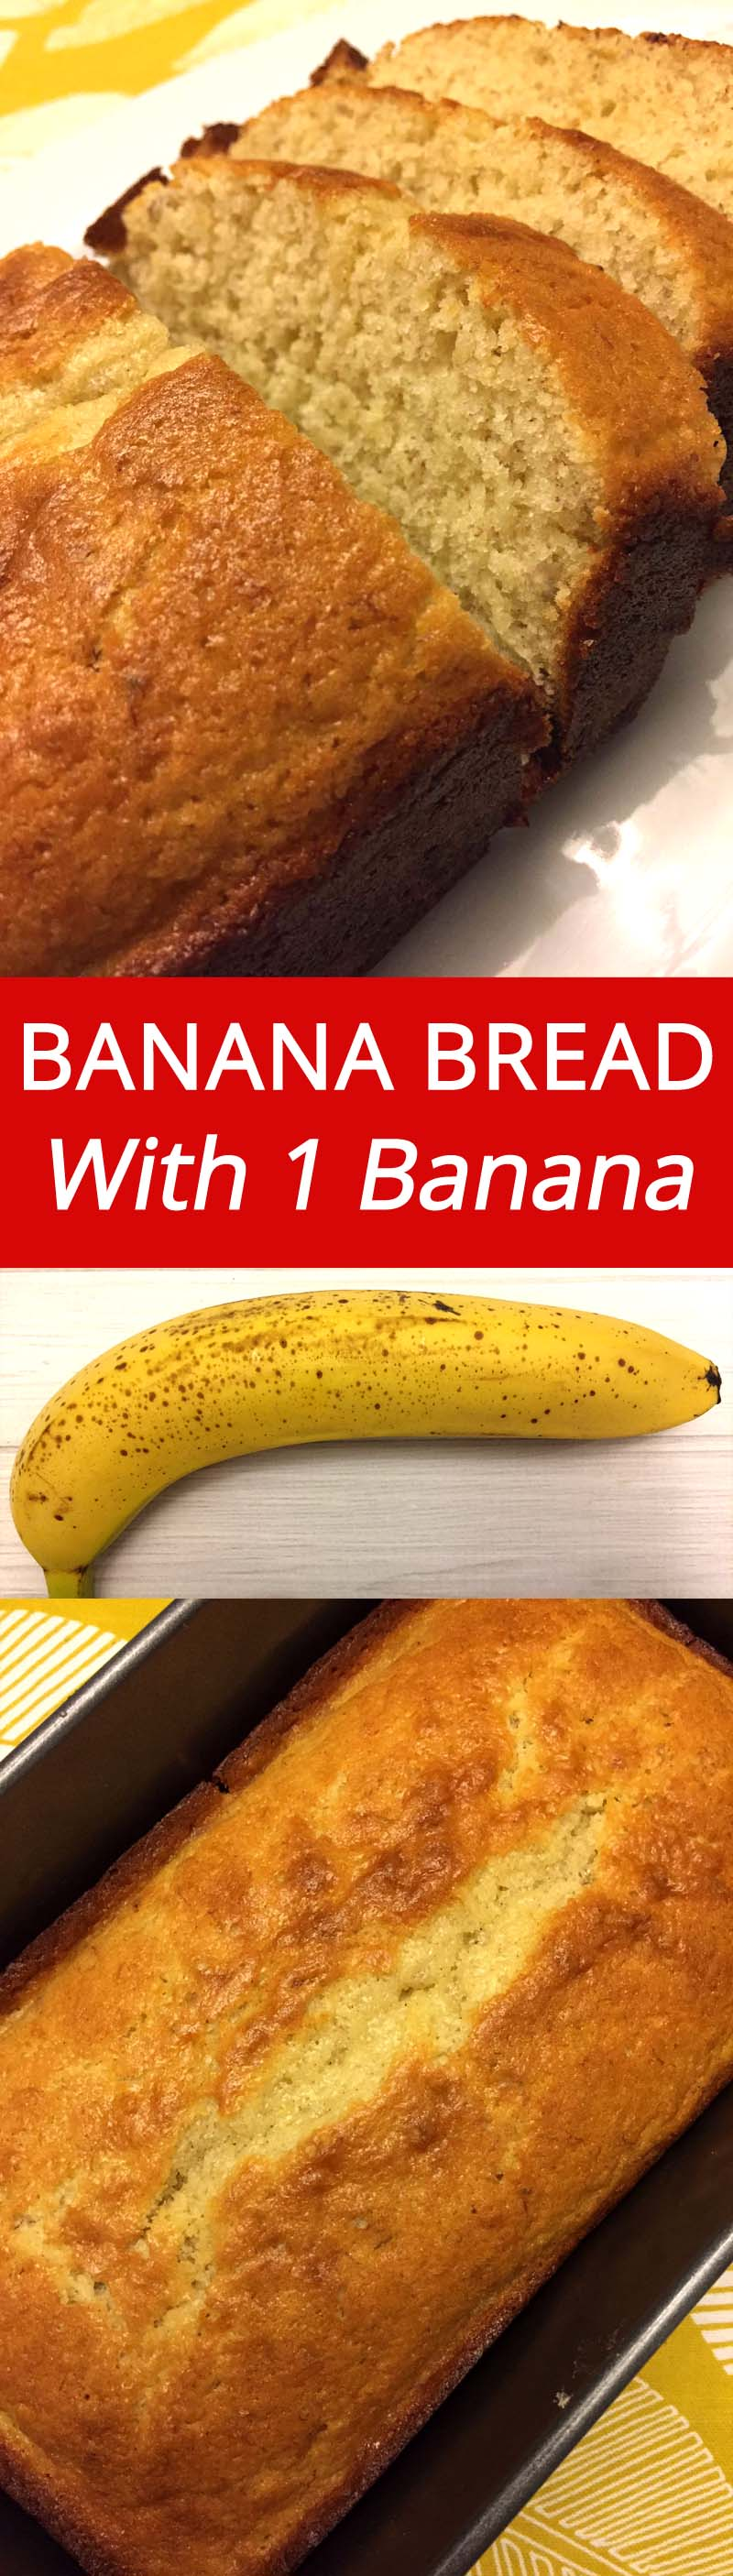 One Banana Banana Bread :)  YUM YUM YUM! Using just 1 overripe banana, this banana bread is so delicious! | MelanieCooks.com